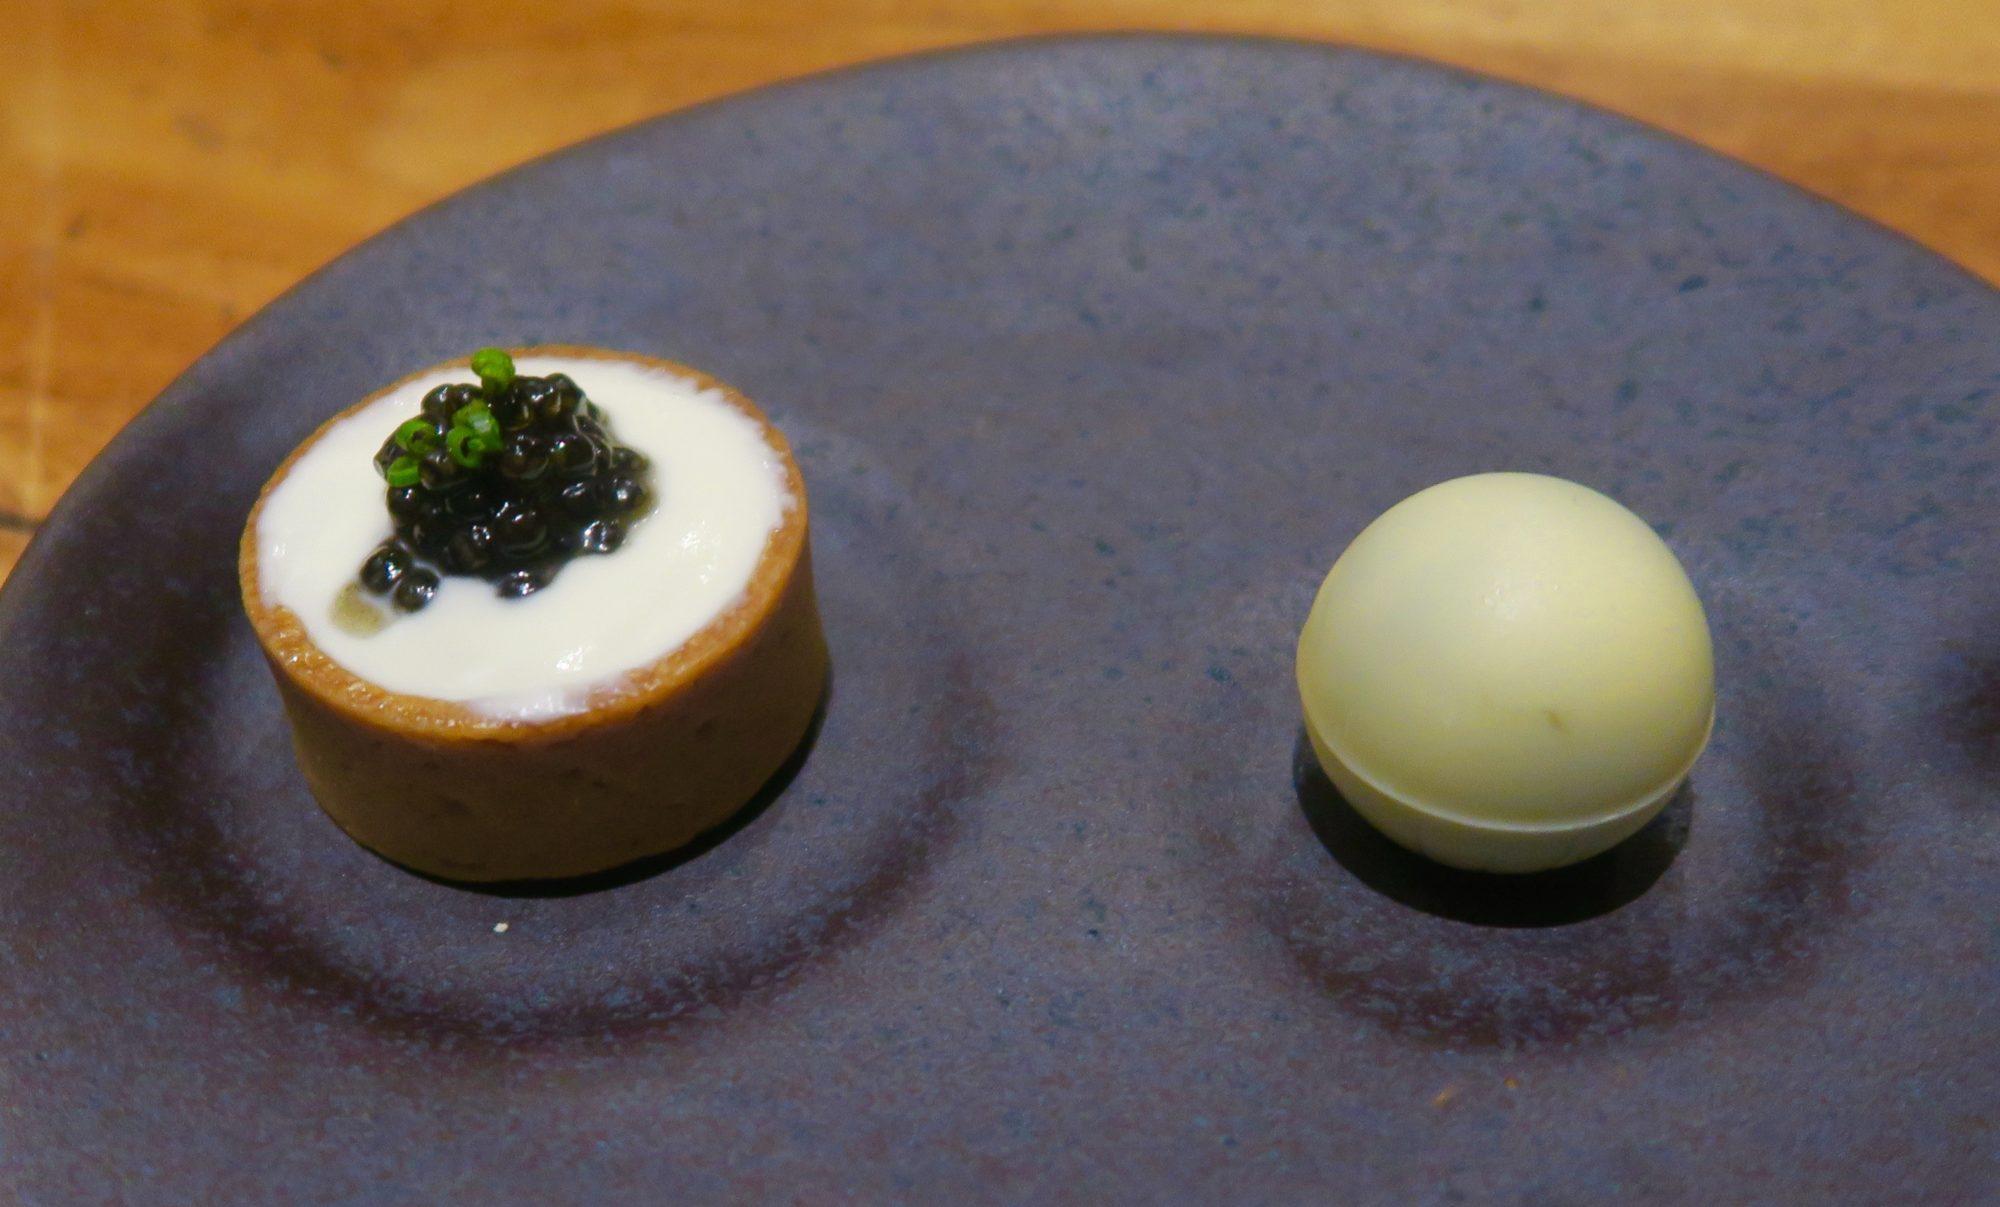 Quail Egg with Caviar and Chocolate Caviar Truffle, 5 Fusion